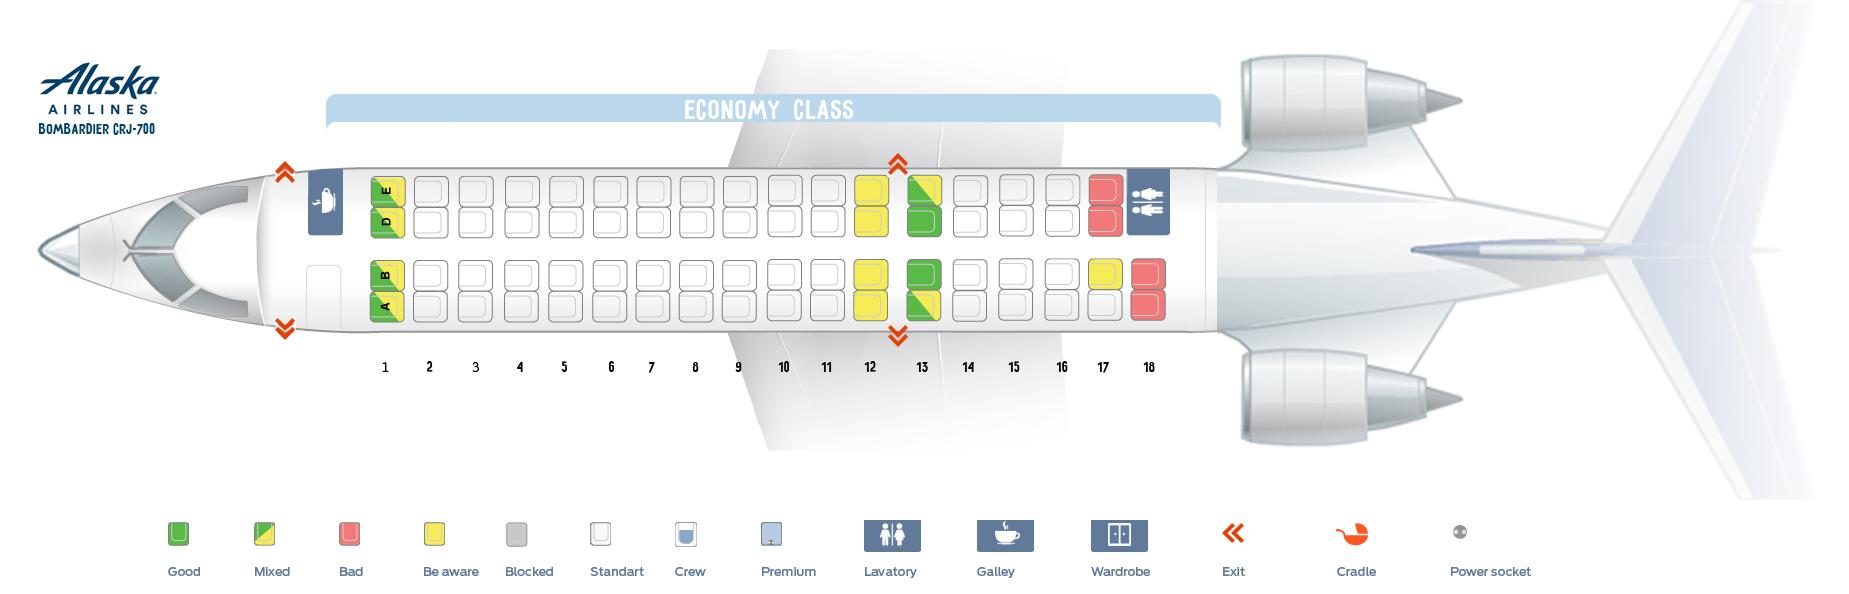 Seat map Bombardier CRJ-700 Alaska Airlines